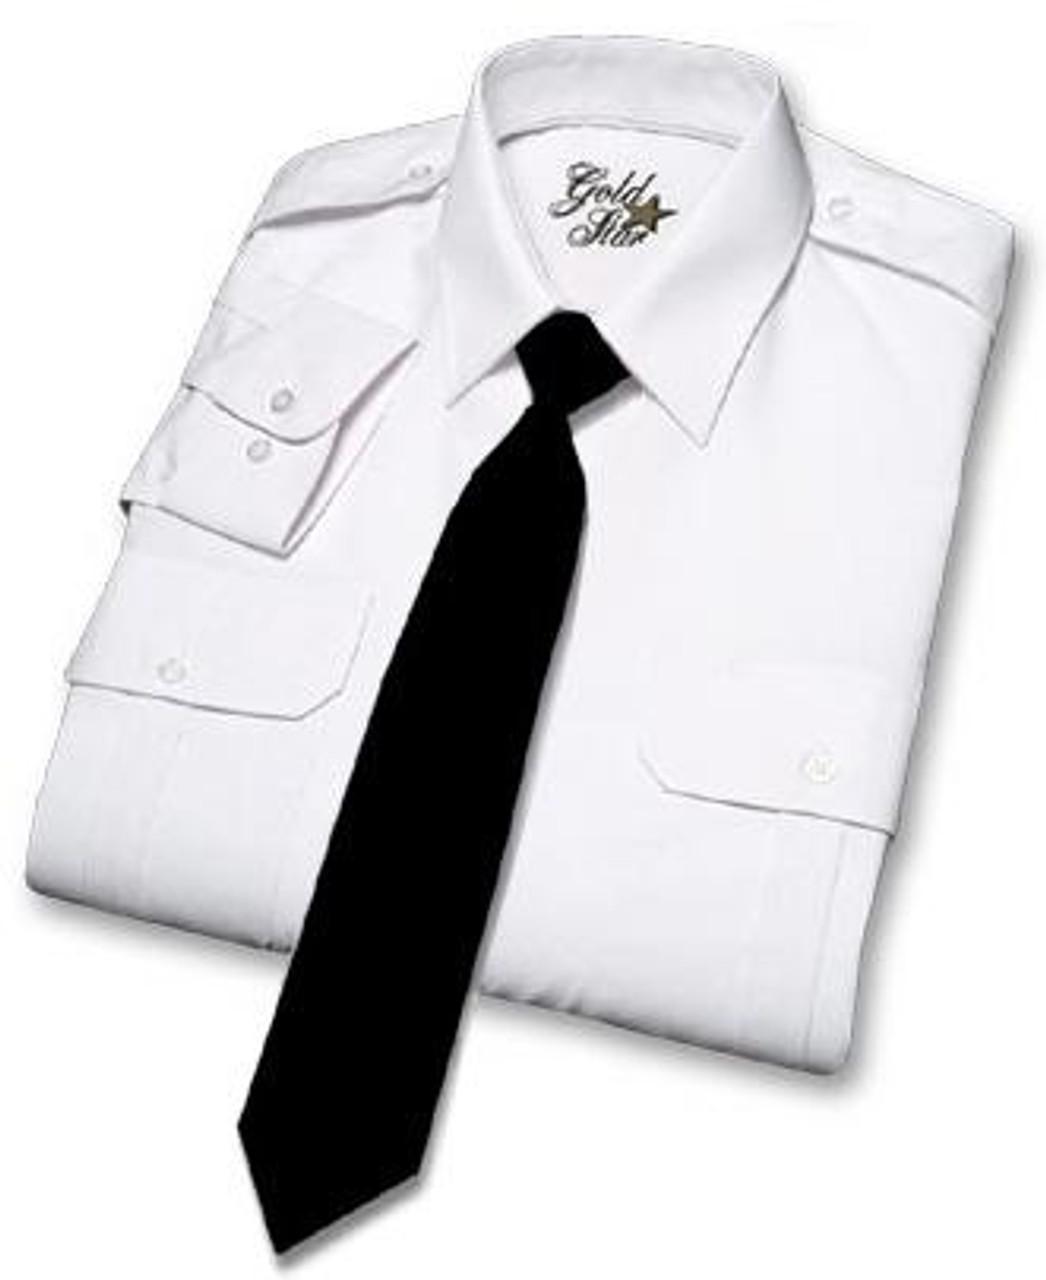 Goldstar Pilot Shirts (Long Sleeved) - Men